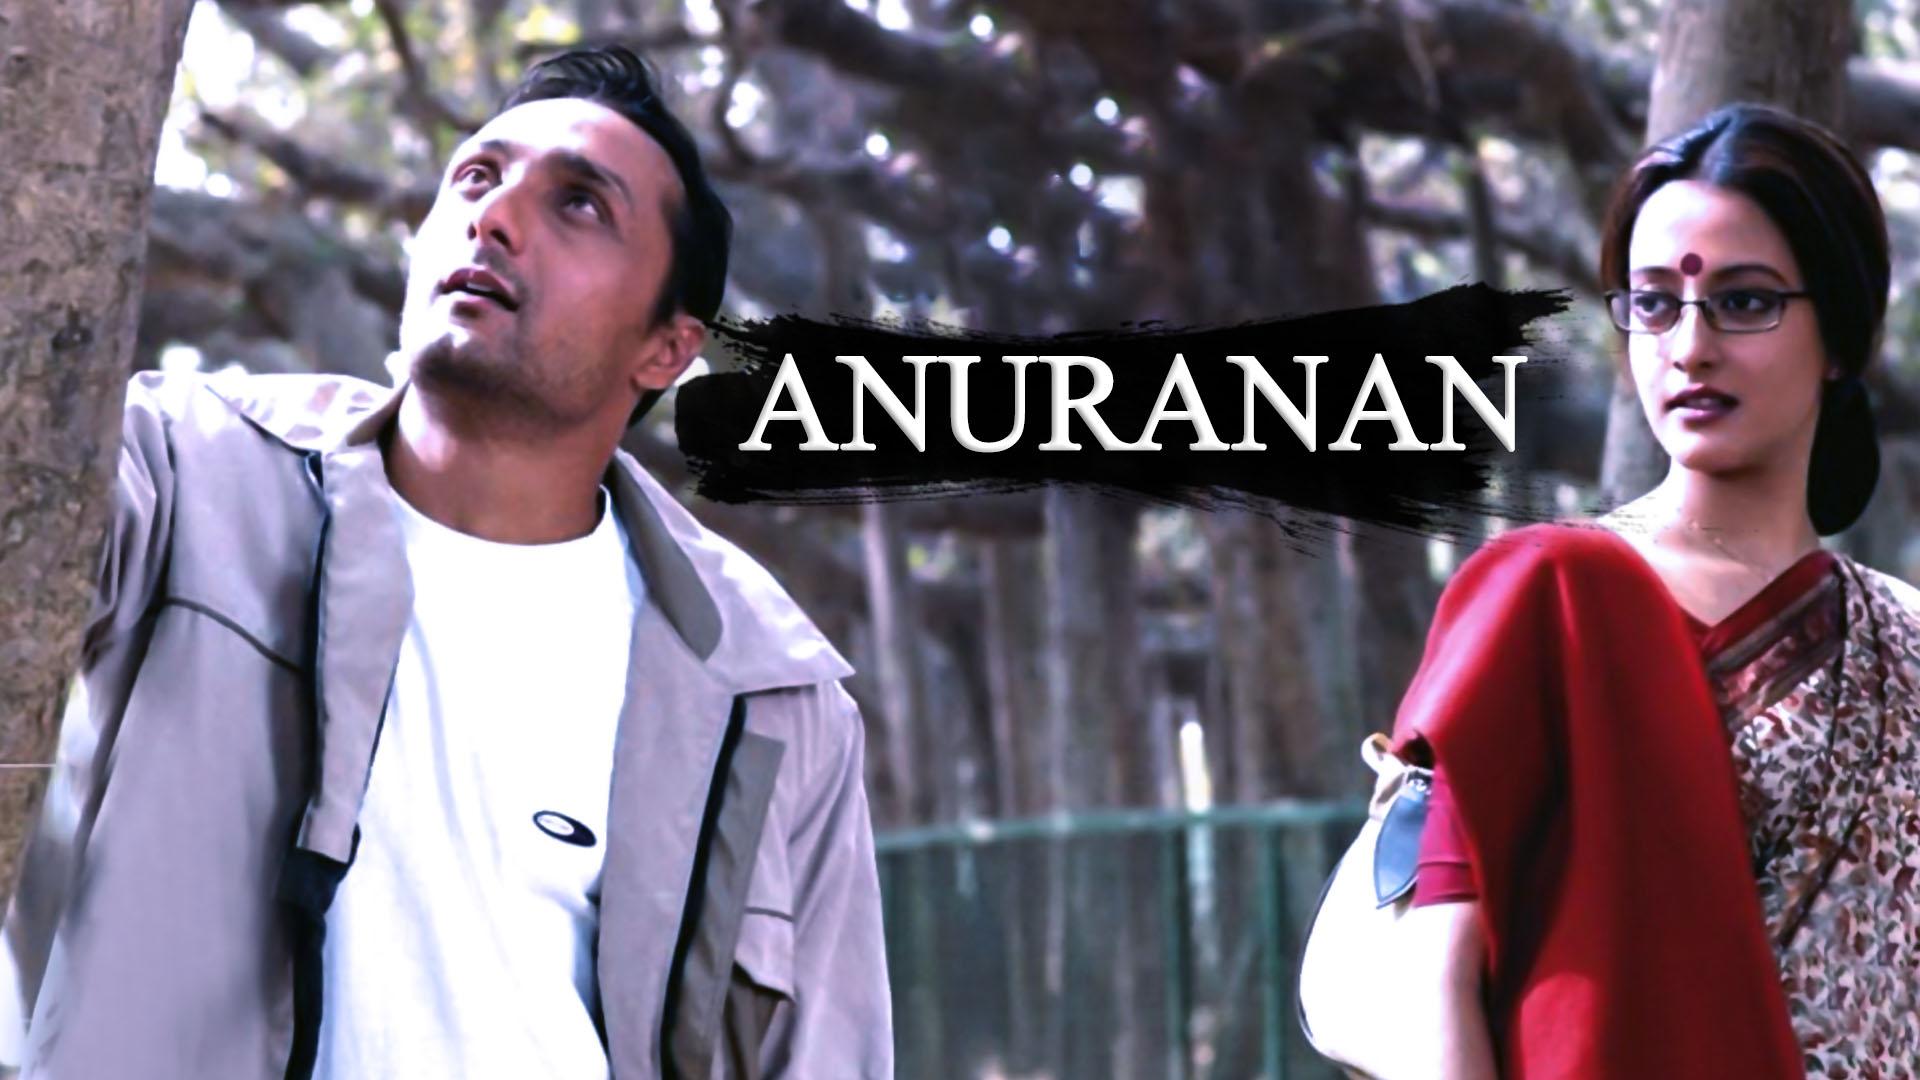 Anuranan (Hindi Dubbed)